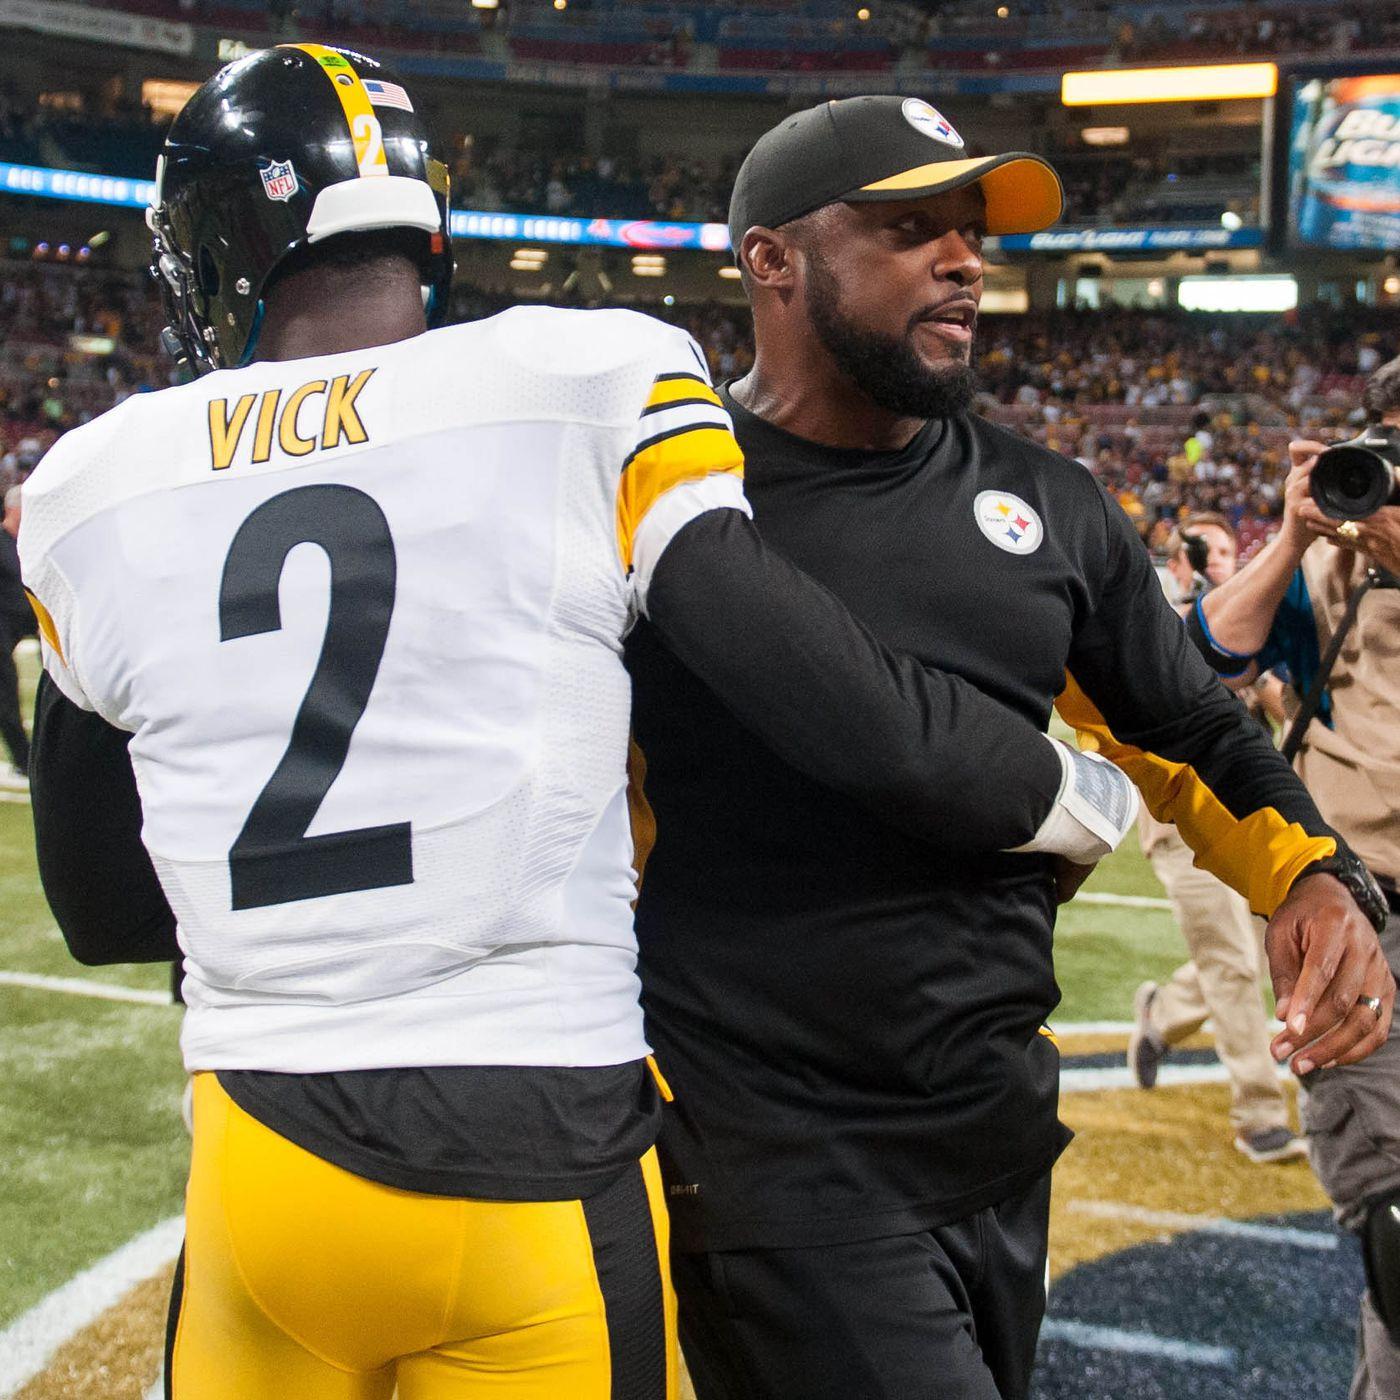 factory authentic 0e0ea aae0c Pittsburgh Steelers quarterback Michael Vick faces perhaps ...